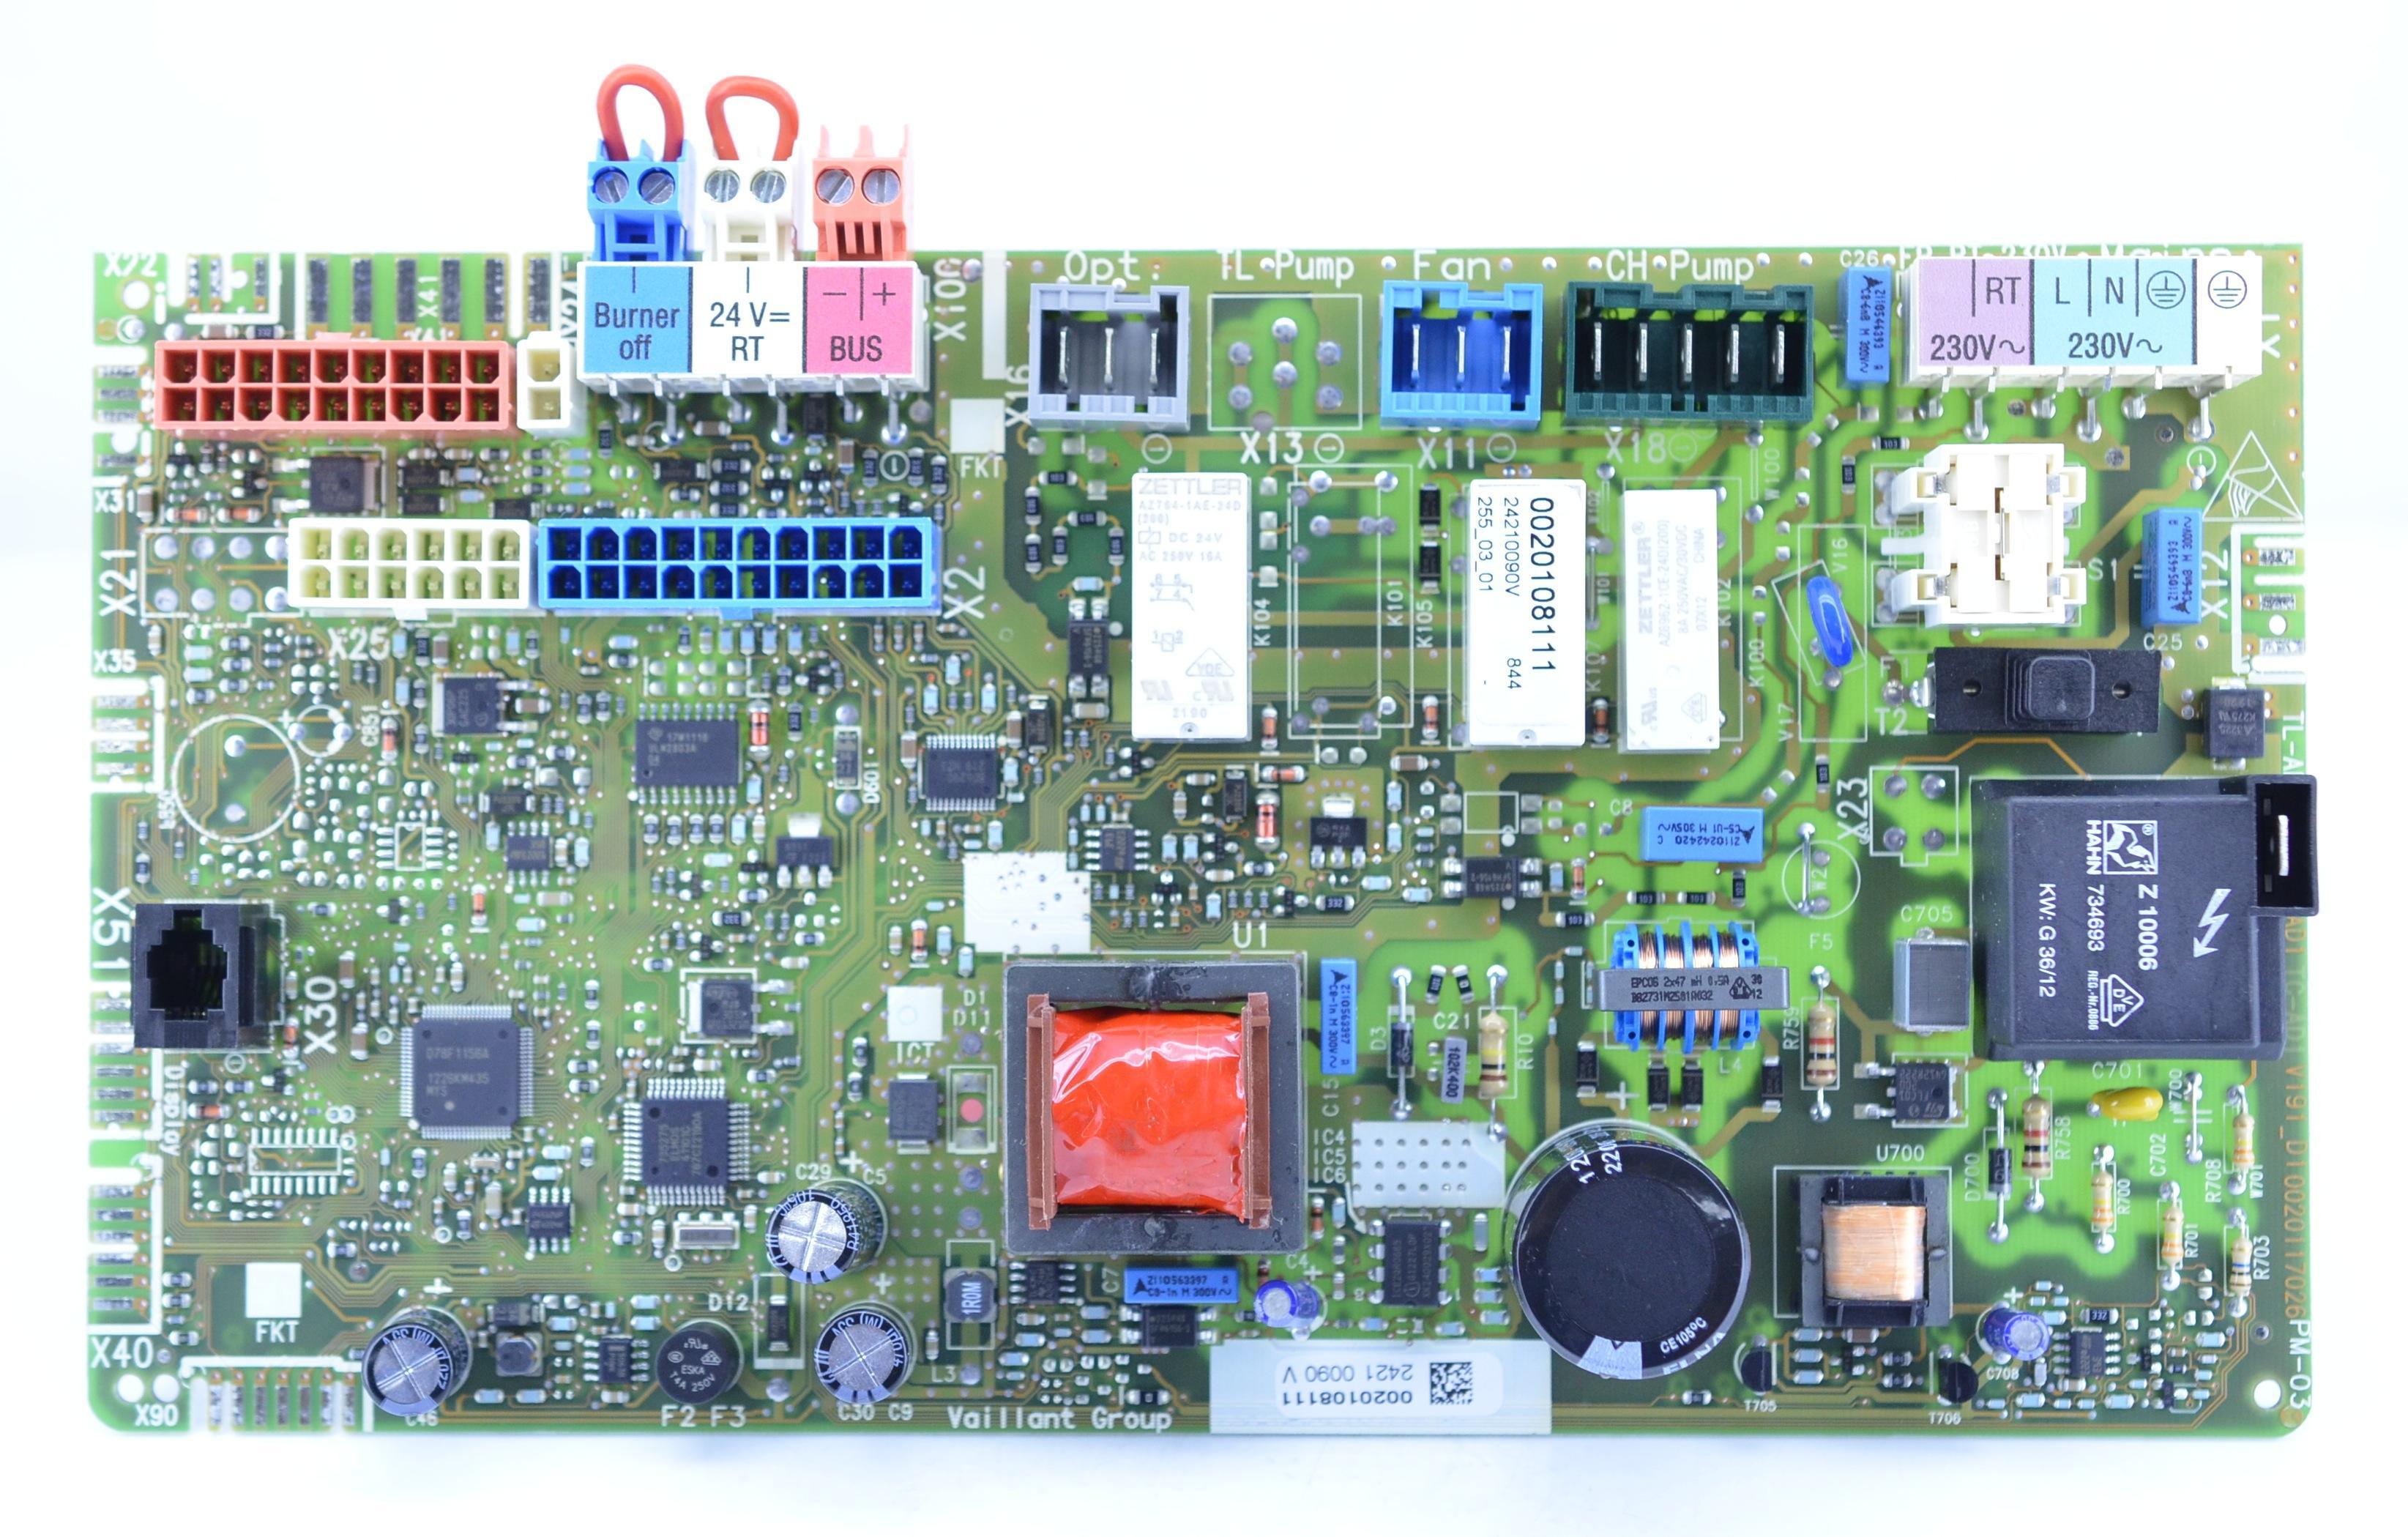 Vaillant Ecotec Plus 824 831 837 2012 Model Circuit Board Pcb 101 How To Build A 0020135165